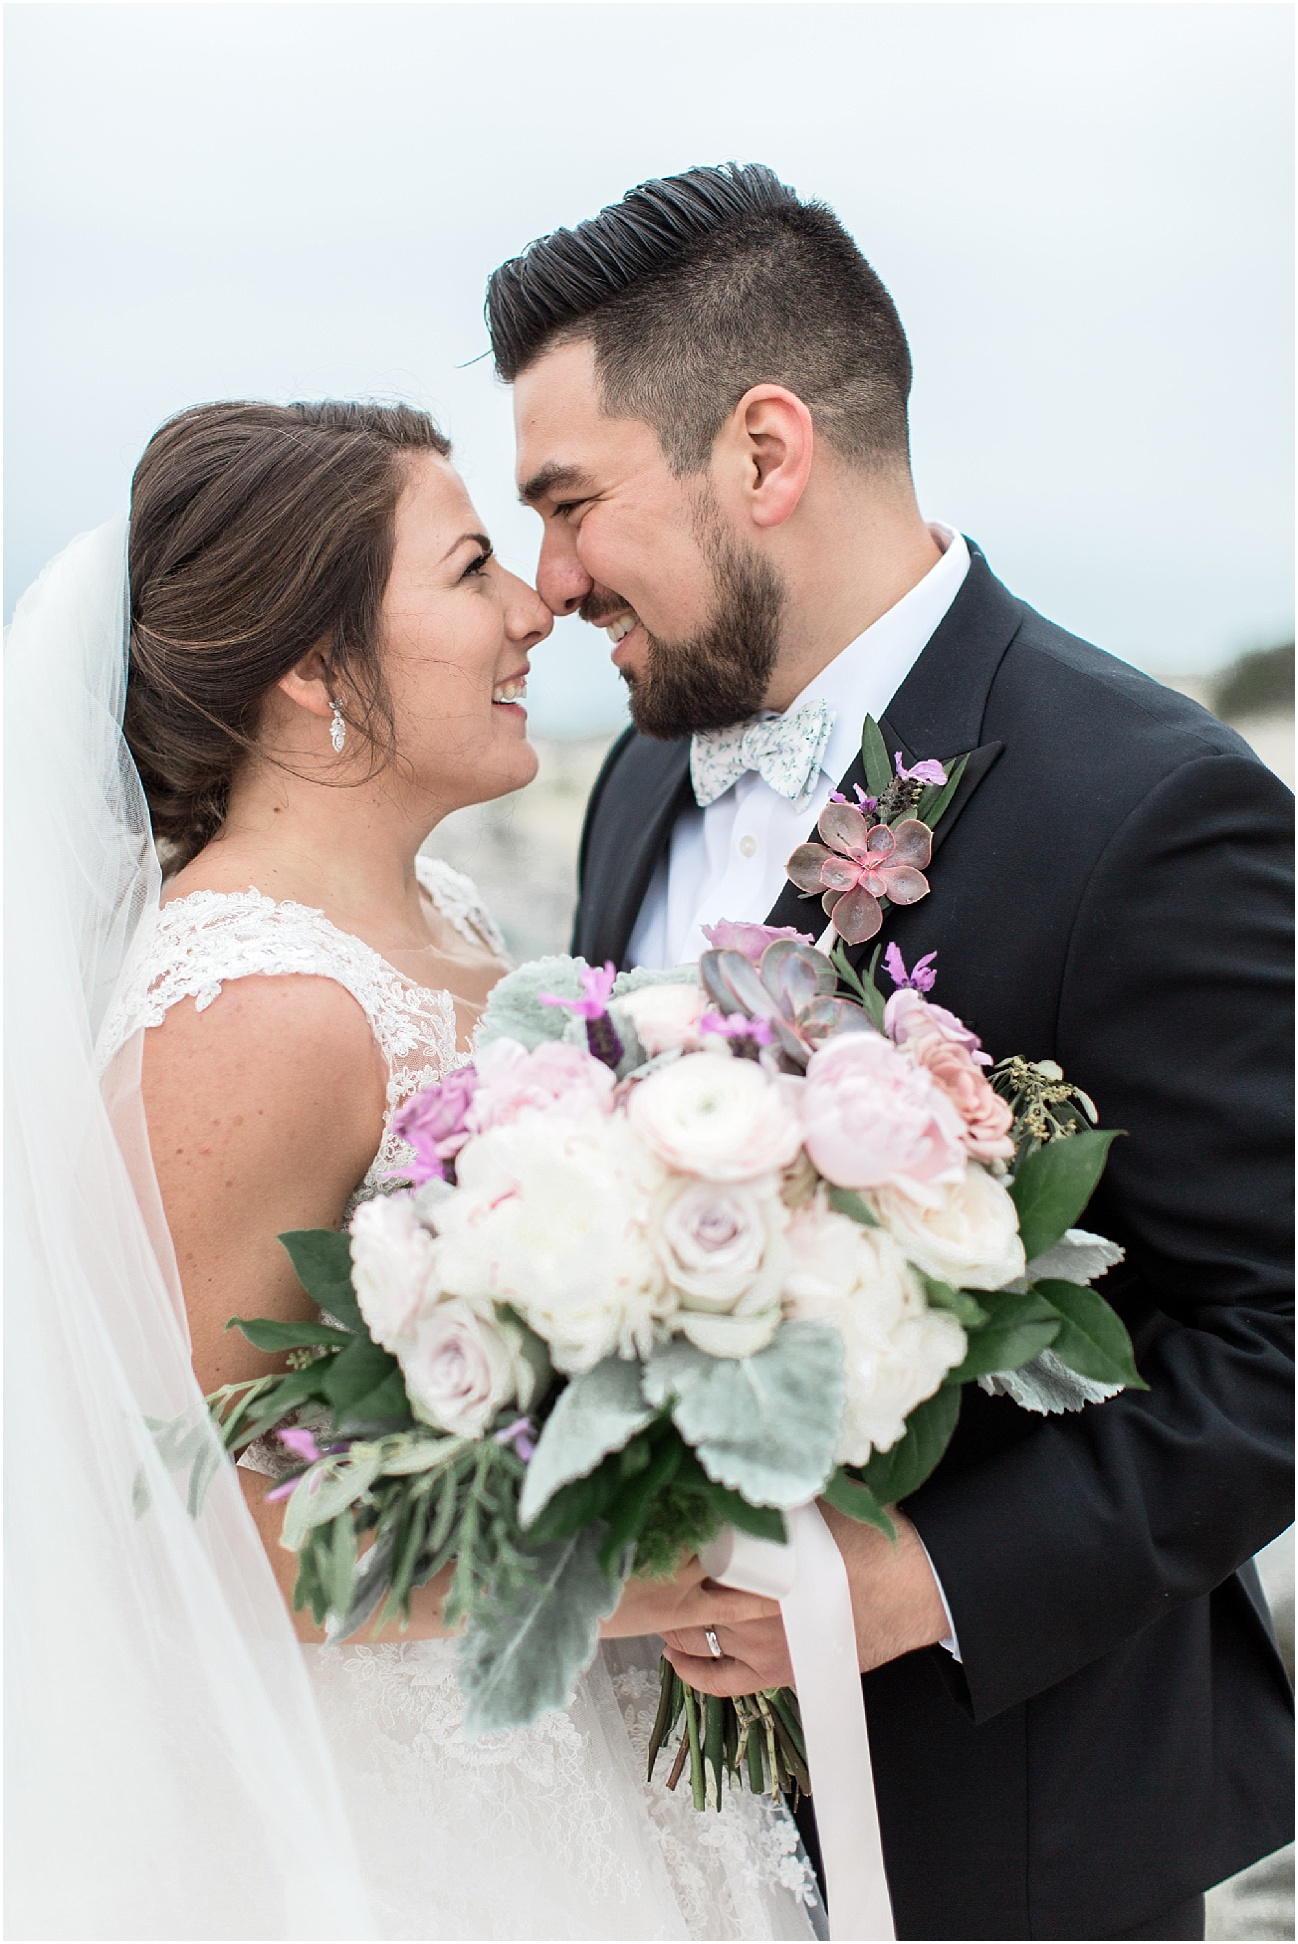 courtney_kurt_cape_cod_popponessett_inn_dowses_beach_boston_wedding_meredith_jane_photography_photo_0051.jpg